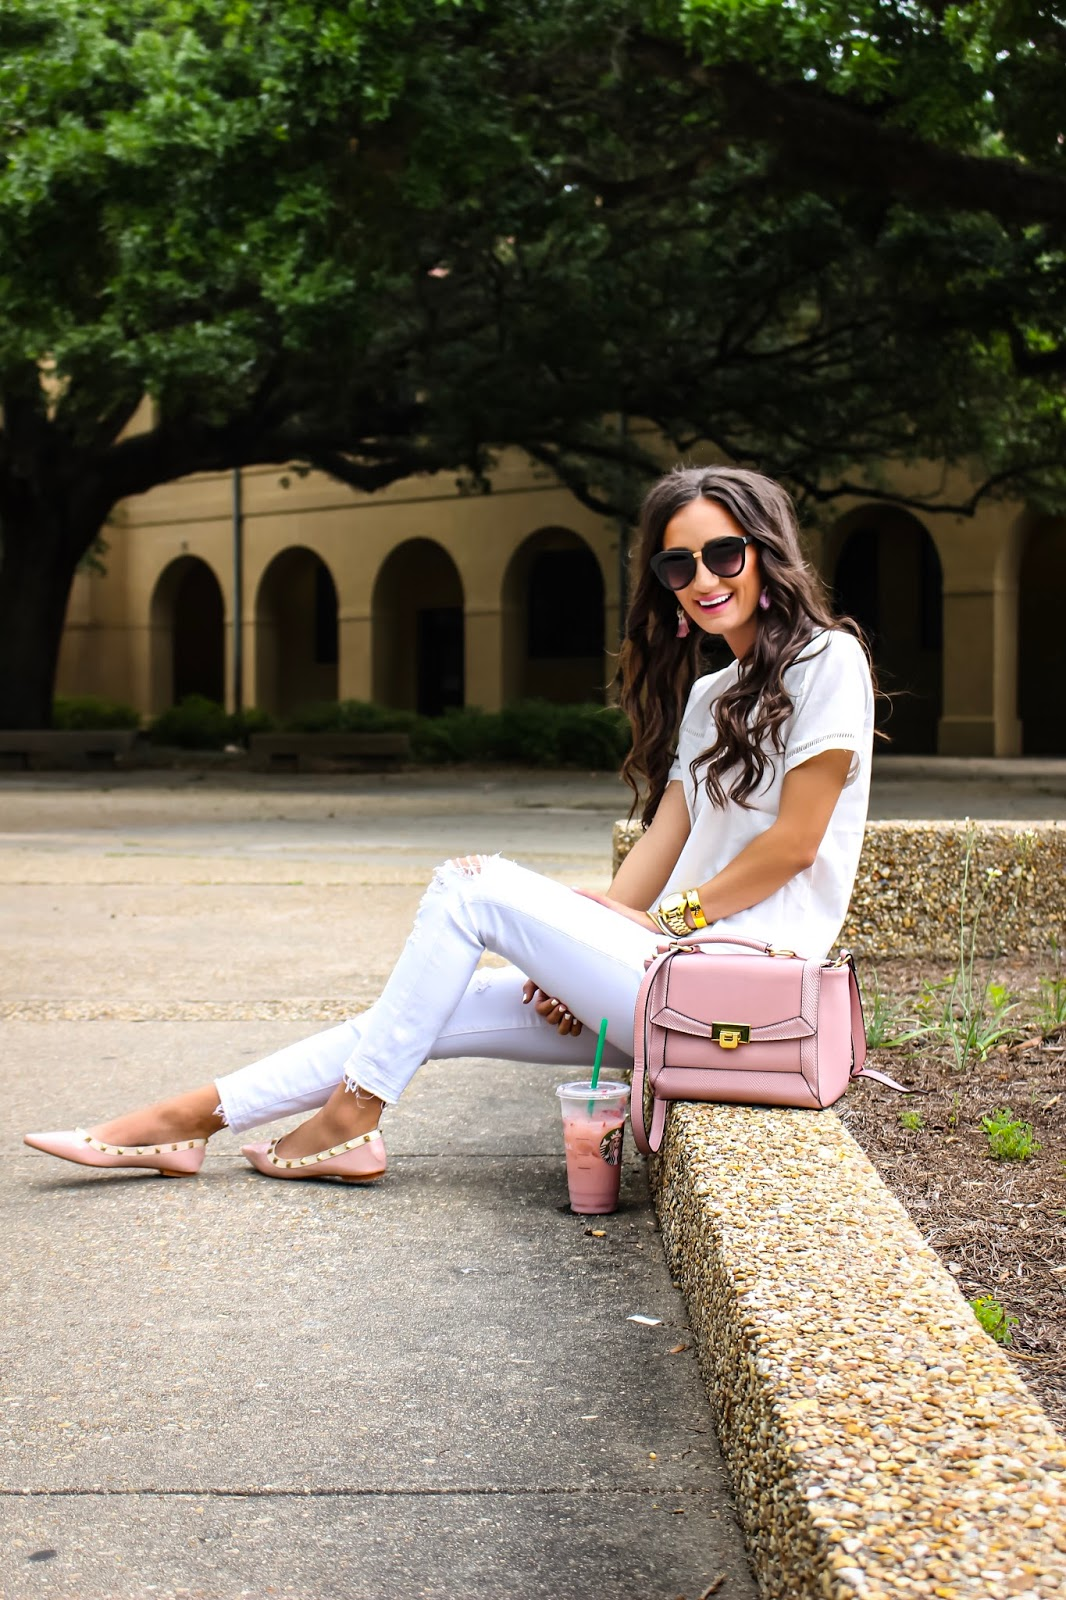 valentino-rockstud-shoe-designer-dupe-every-girl-needs